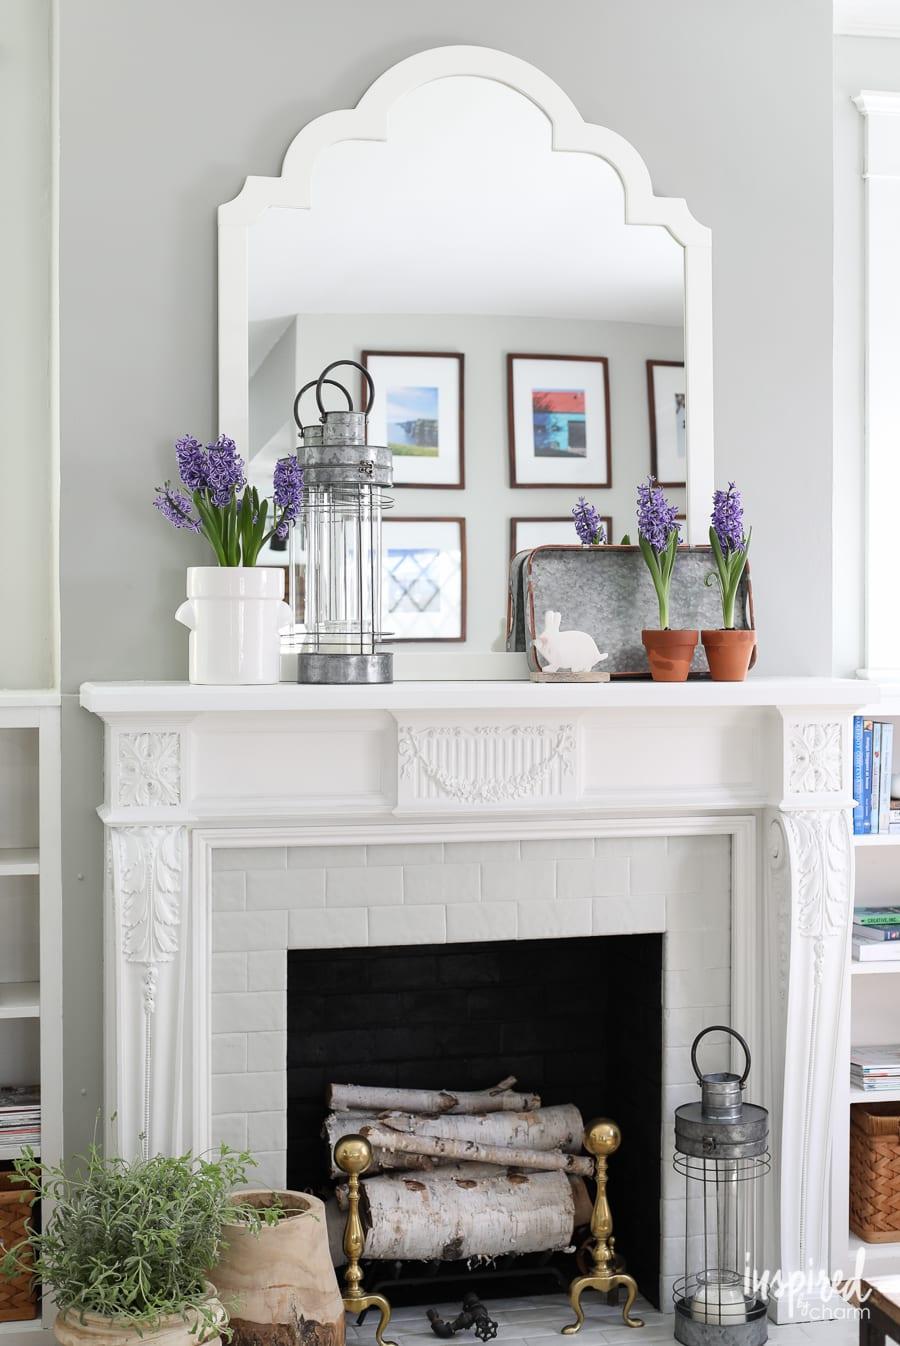 Living Room Mantel Decorating Modern Farmhouse Mantel Decor 2 Ways Inspired By Charm